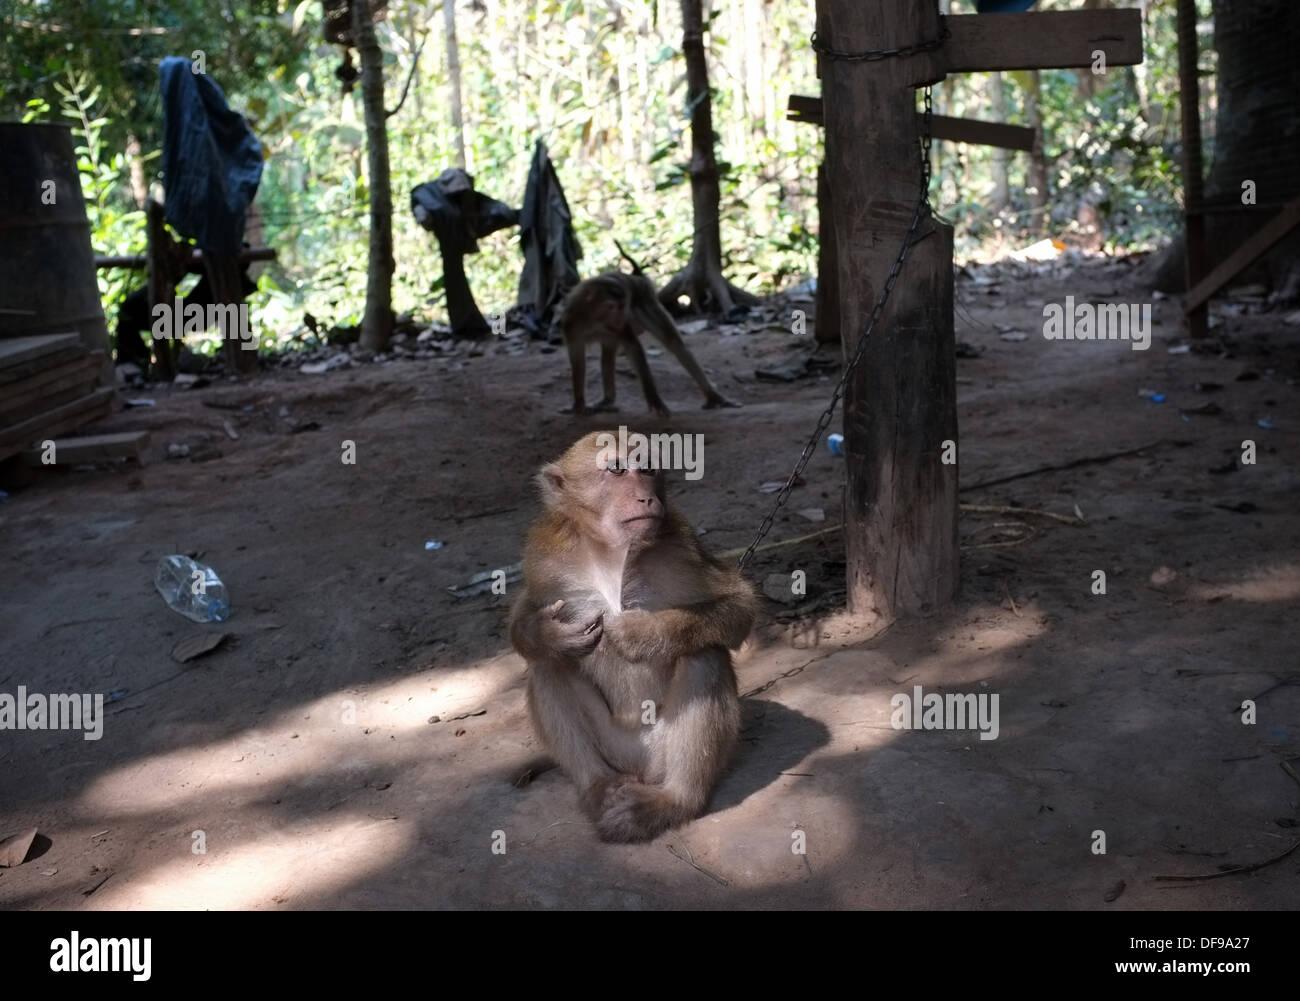 Captive pet monkey in rural Laos - Stock Image